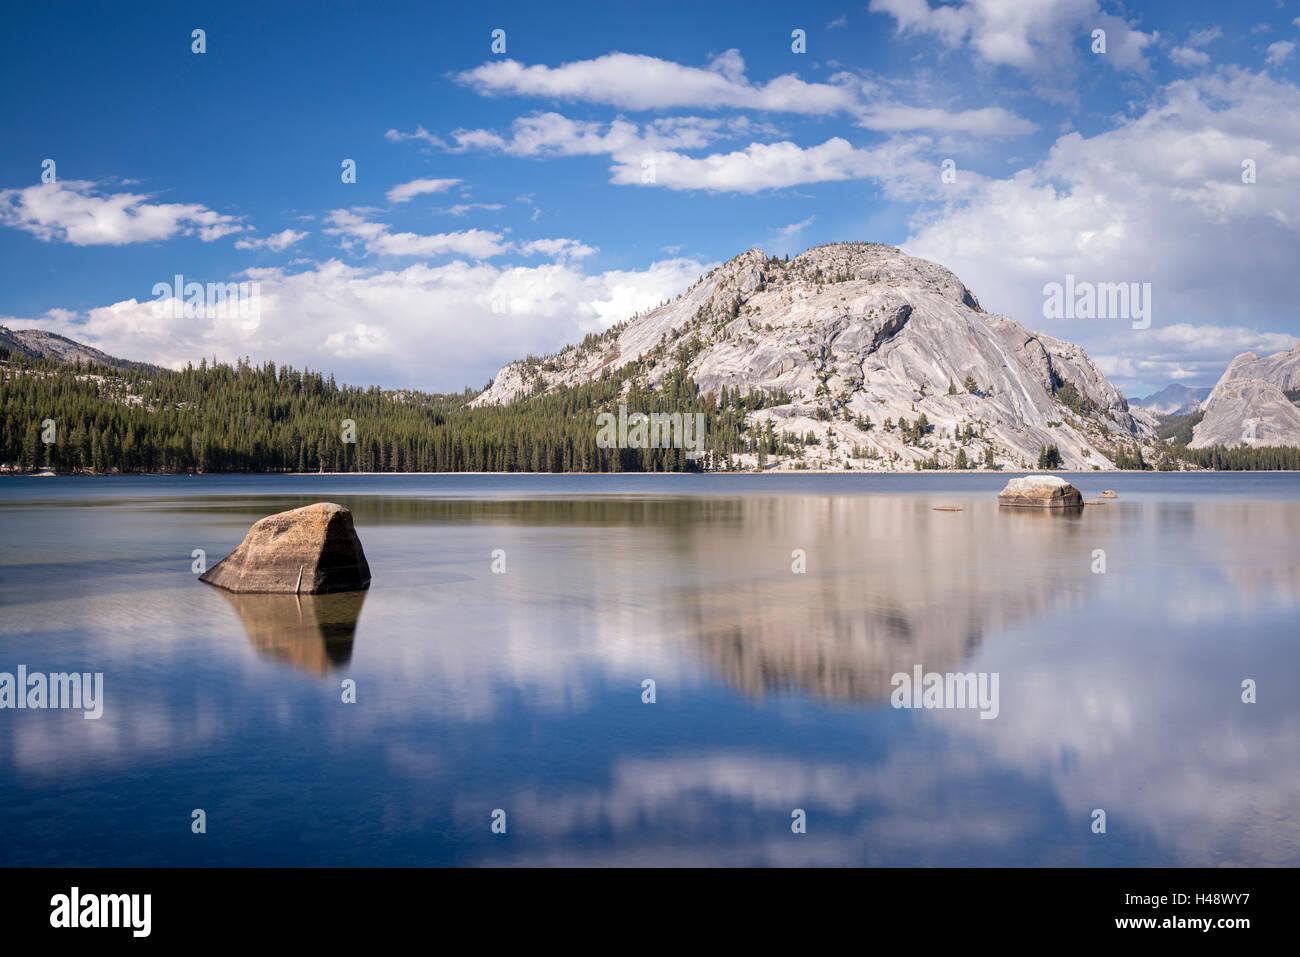 Tenaya Lake in Yosemite National Park, California, USA.  Autumn (October) 2014. - Stock Image